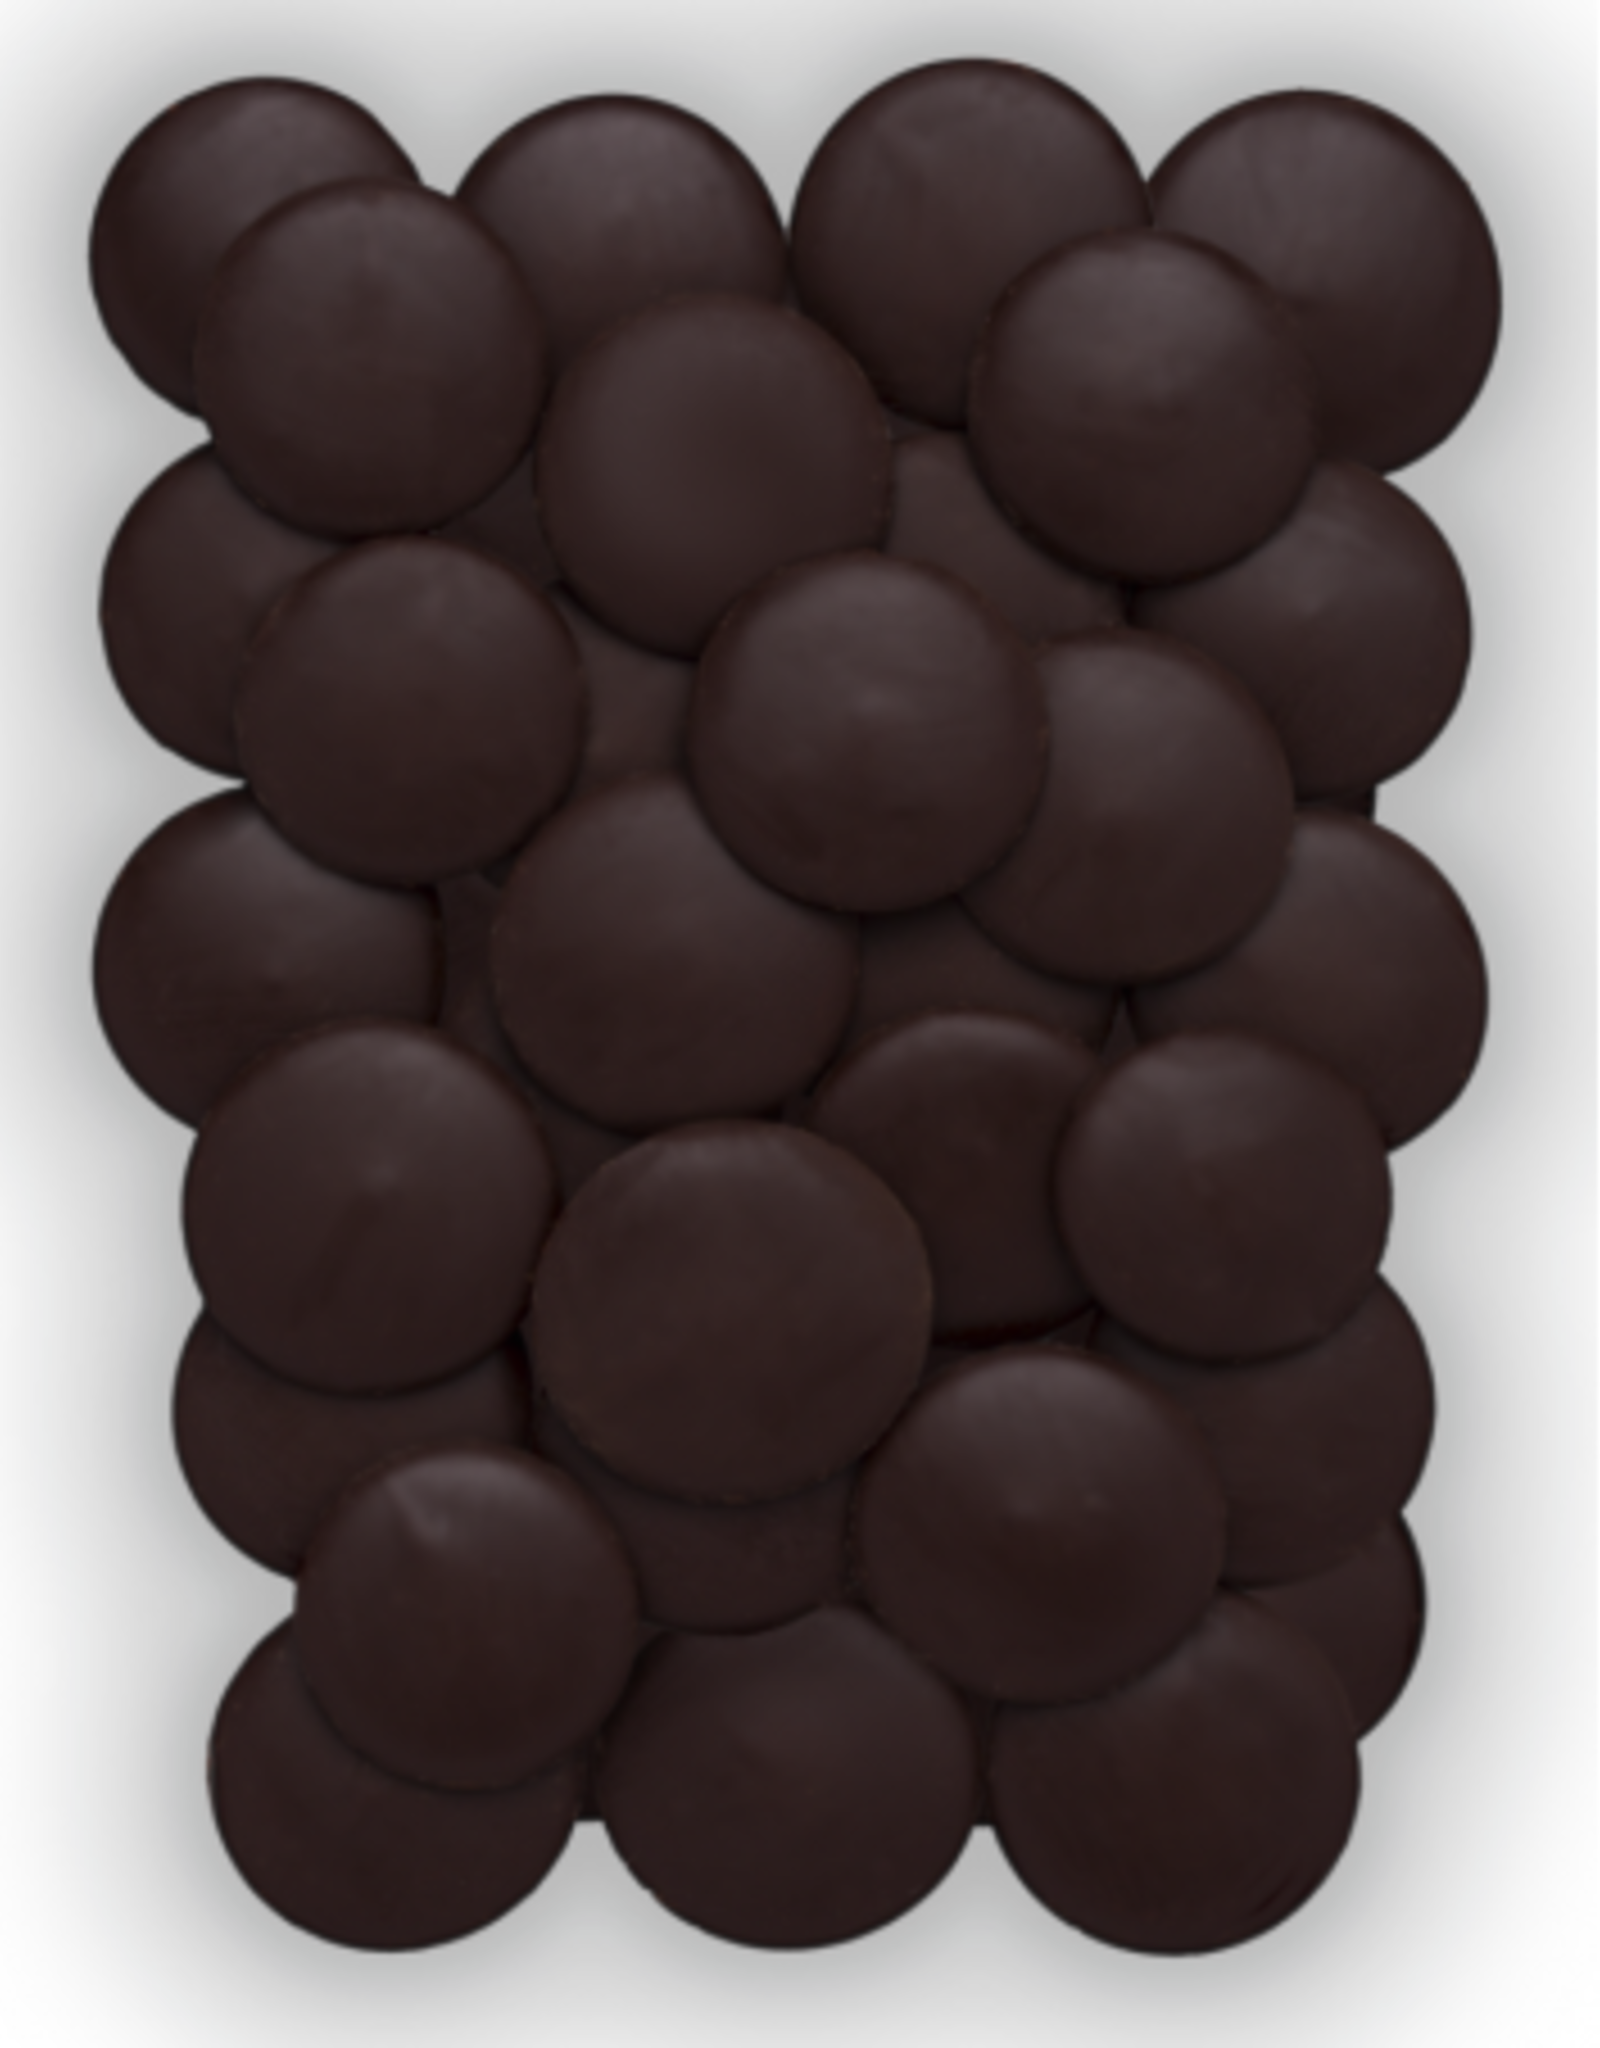 Doisy & Dam Doisy & Dam chocolade buttons 30g